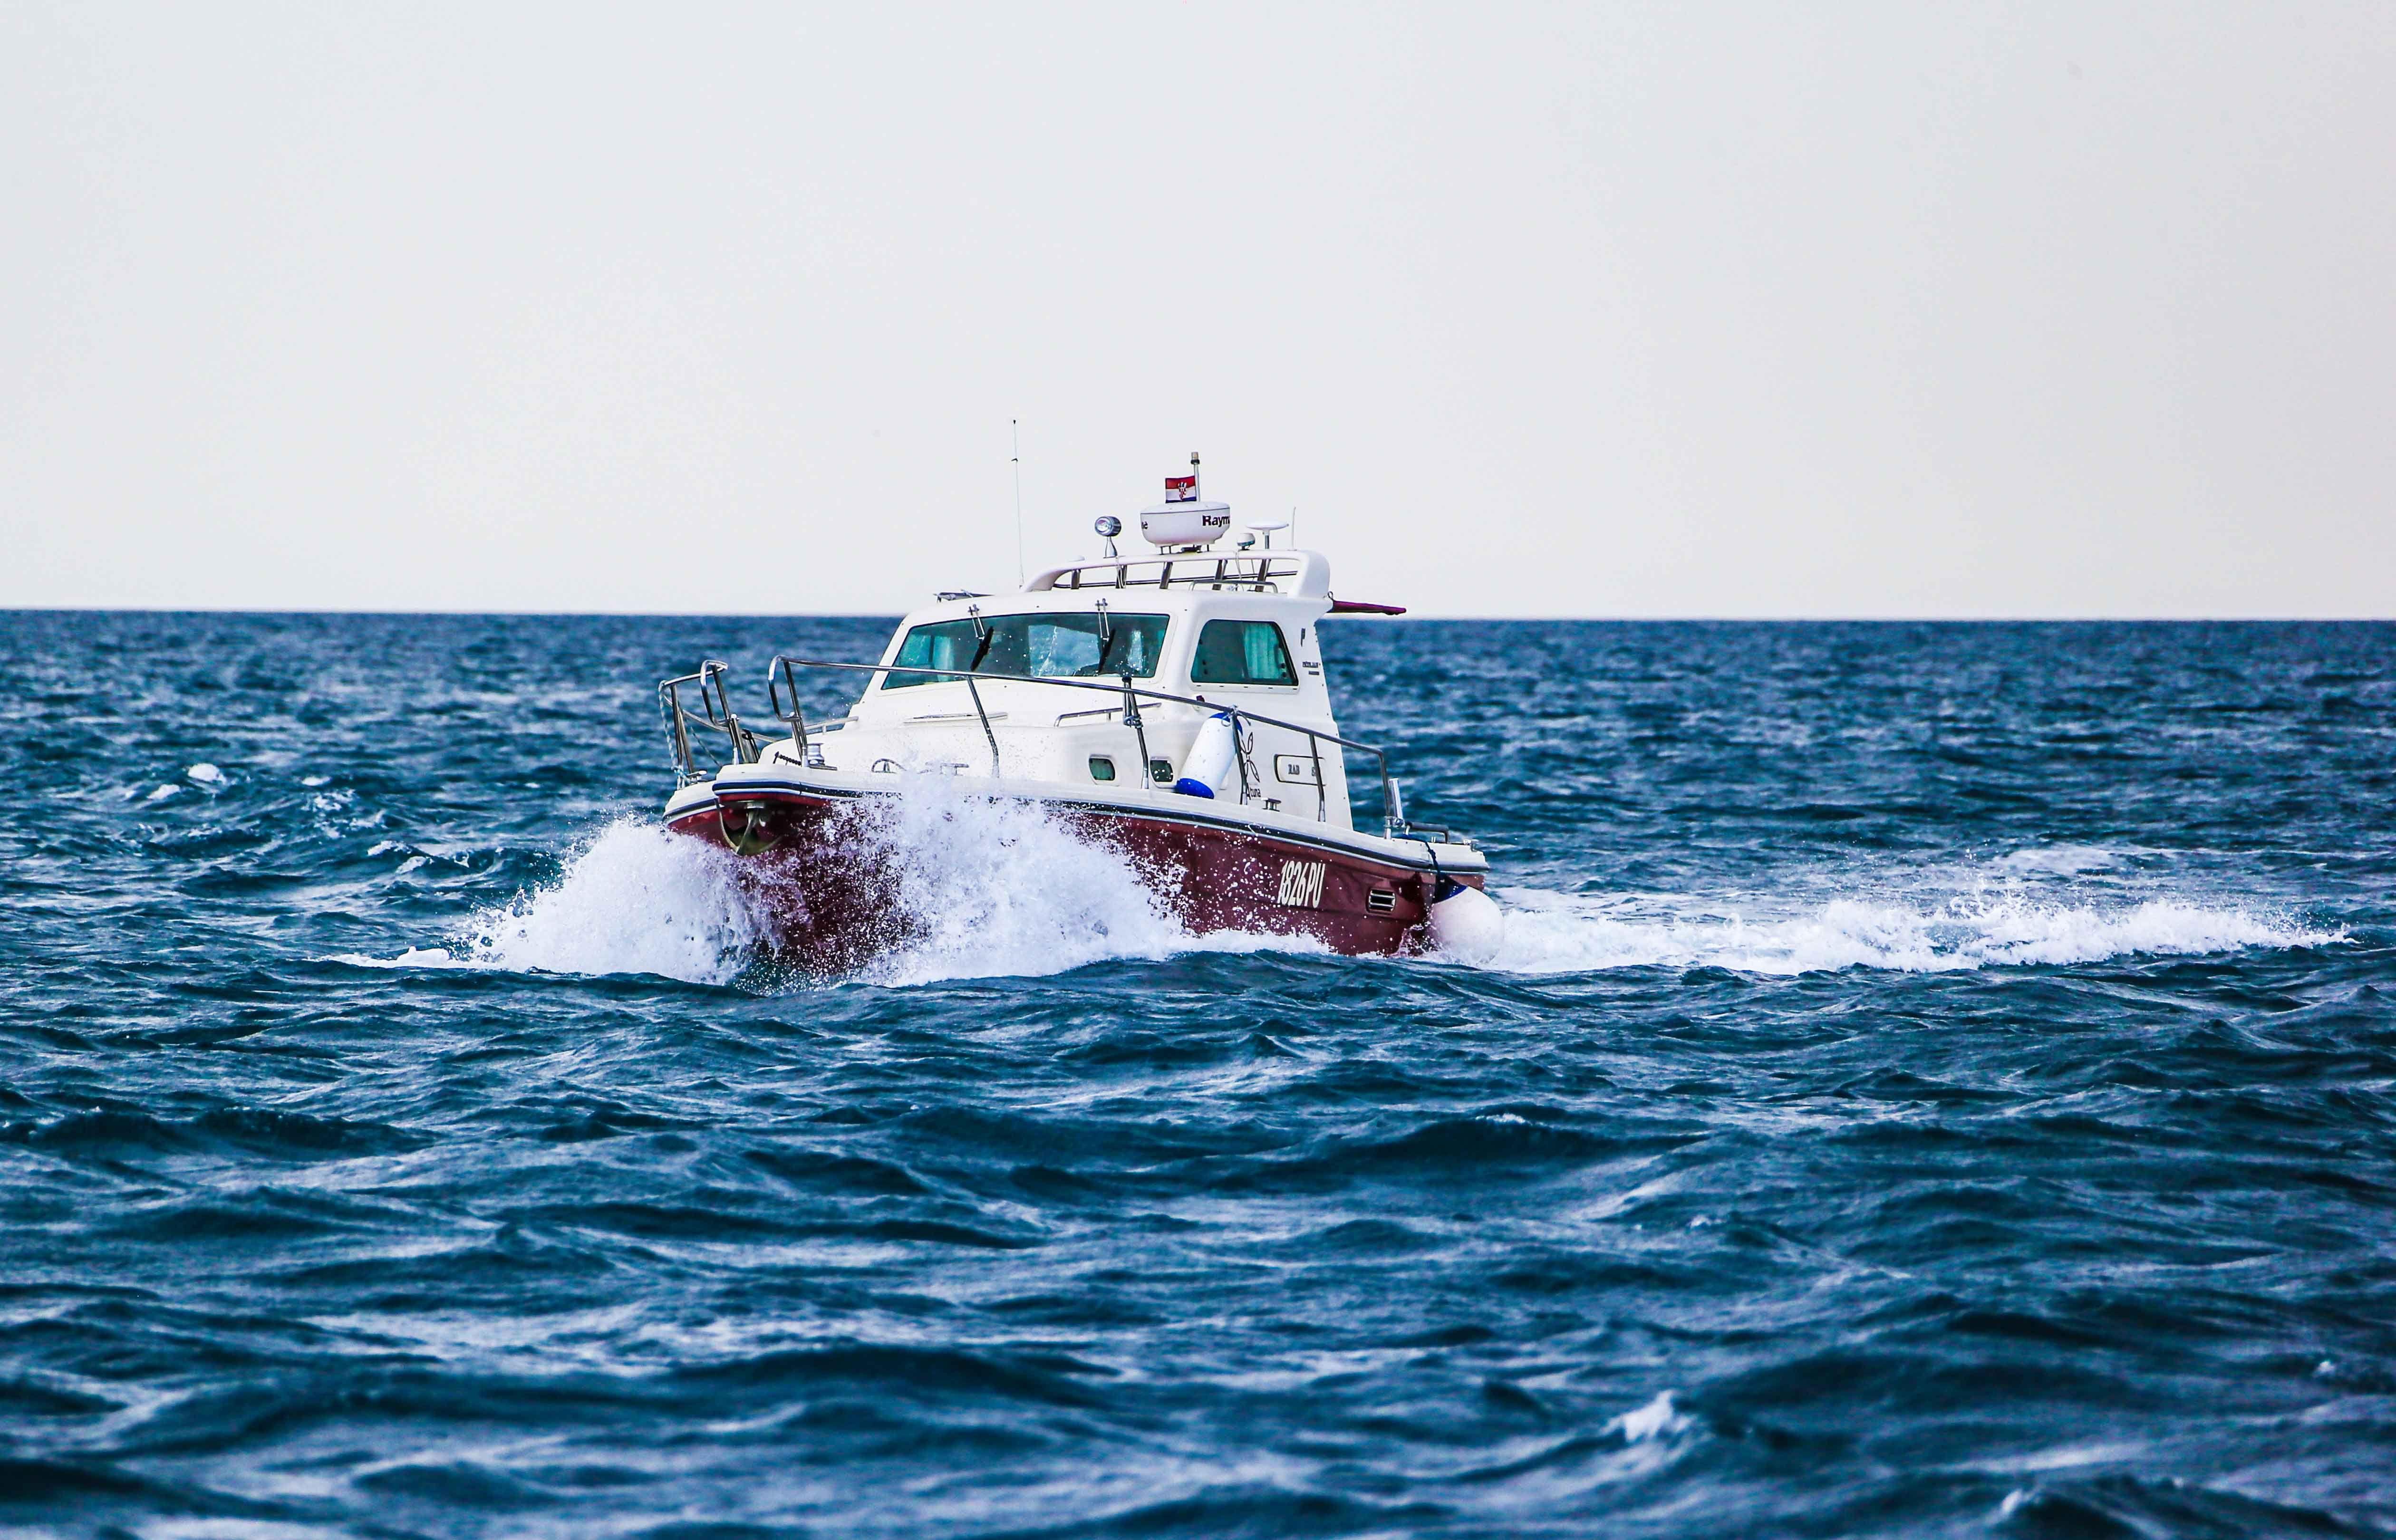 Charter Motor Yacht - The Caribbean